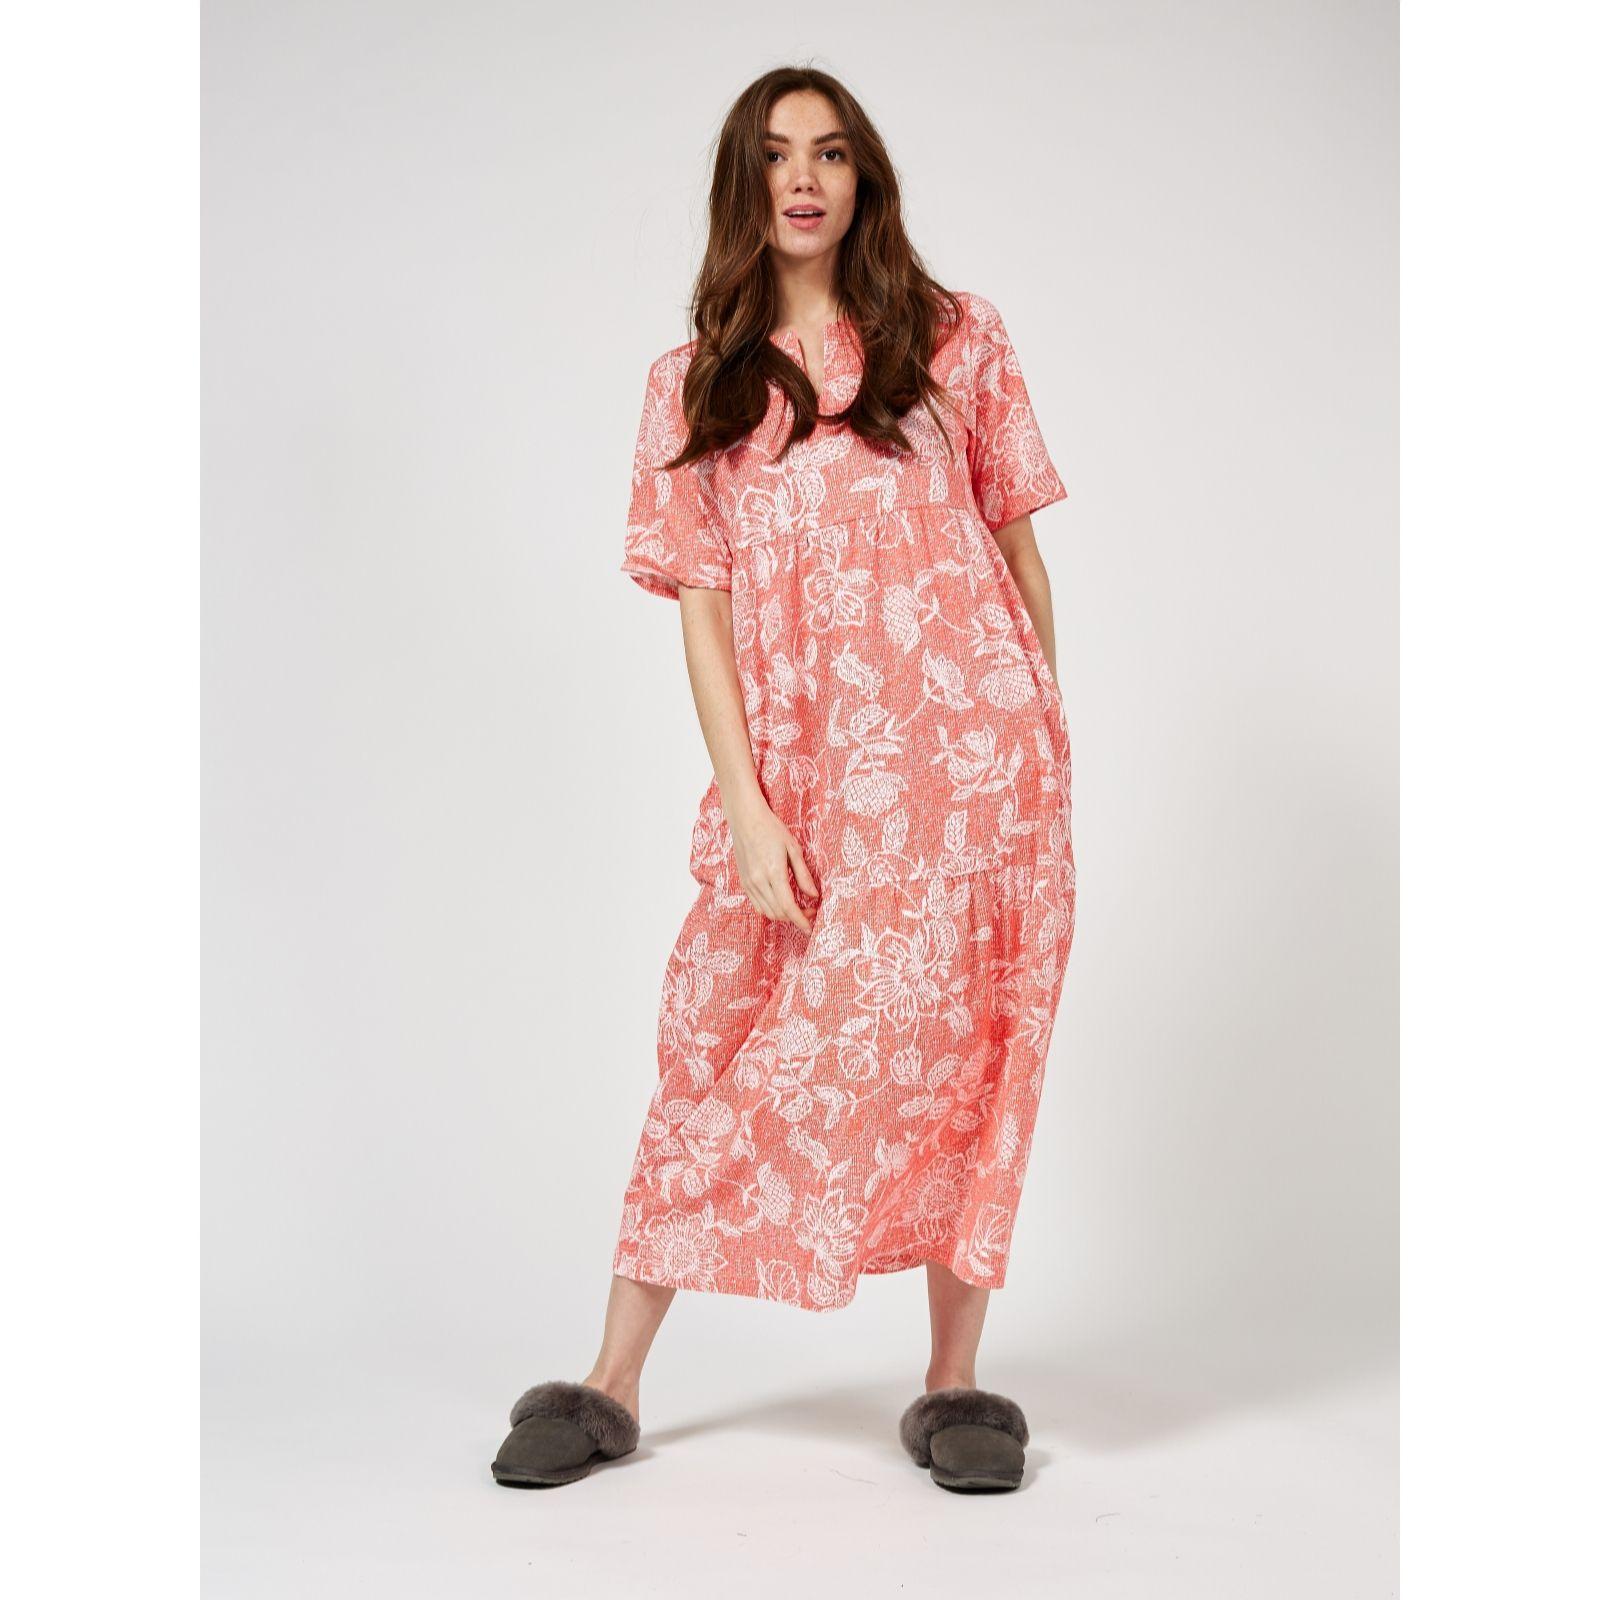 0a878b5d3d Carole Hochman Stamped Floral Cotton Nightdress - QVC UK